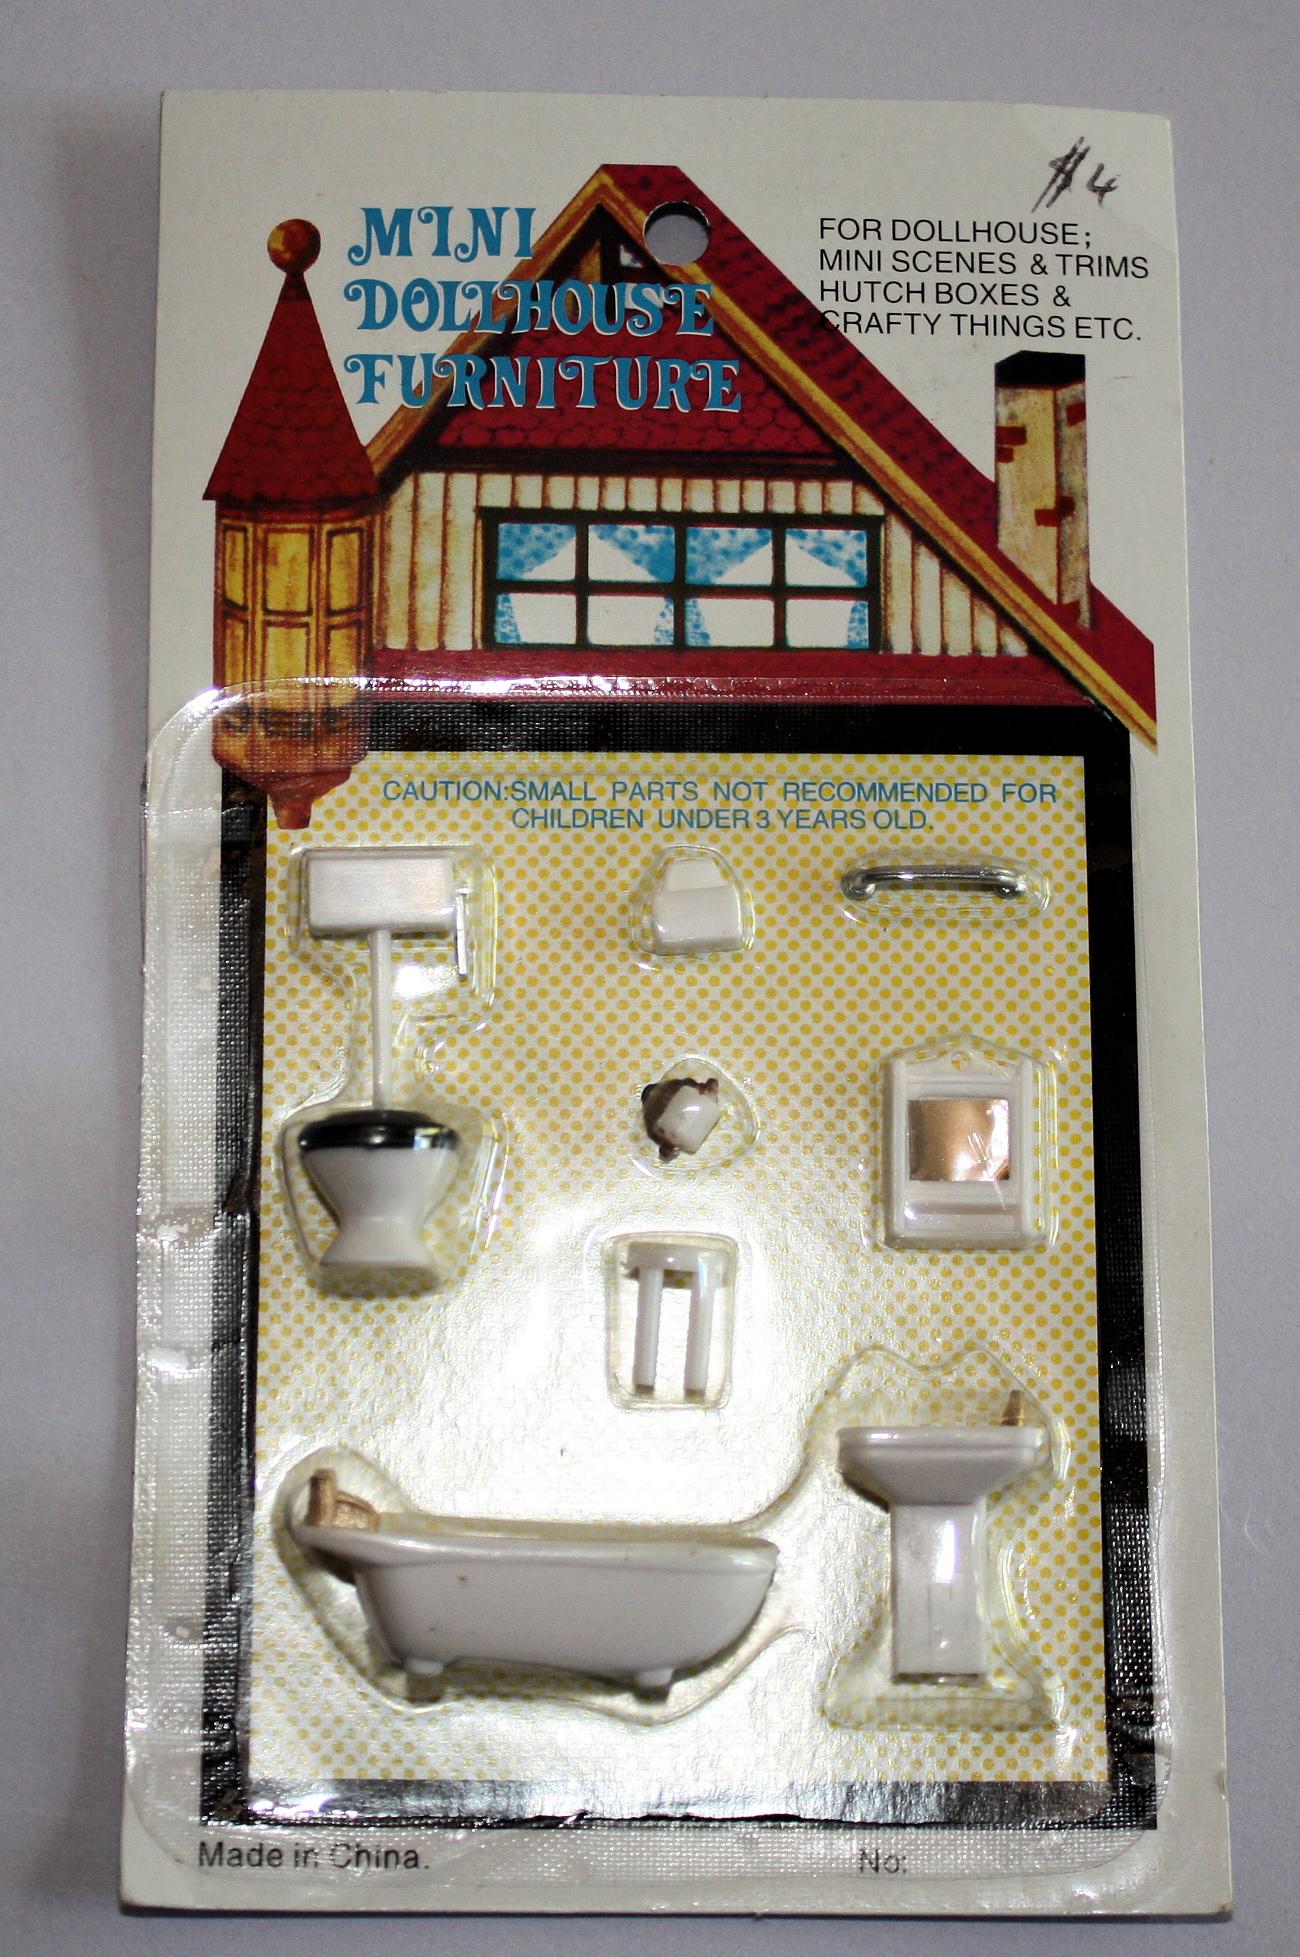 1-48 scale 8 pce bathroom set